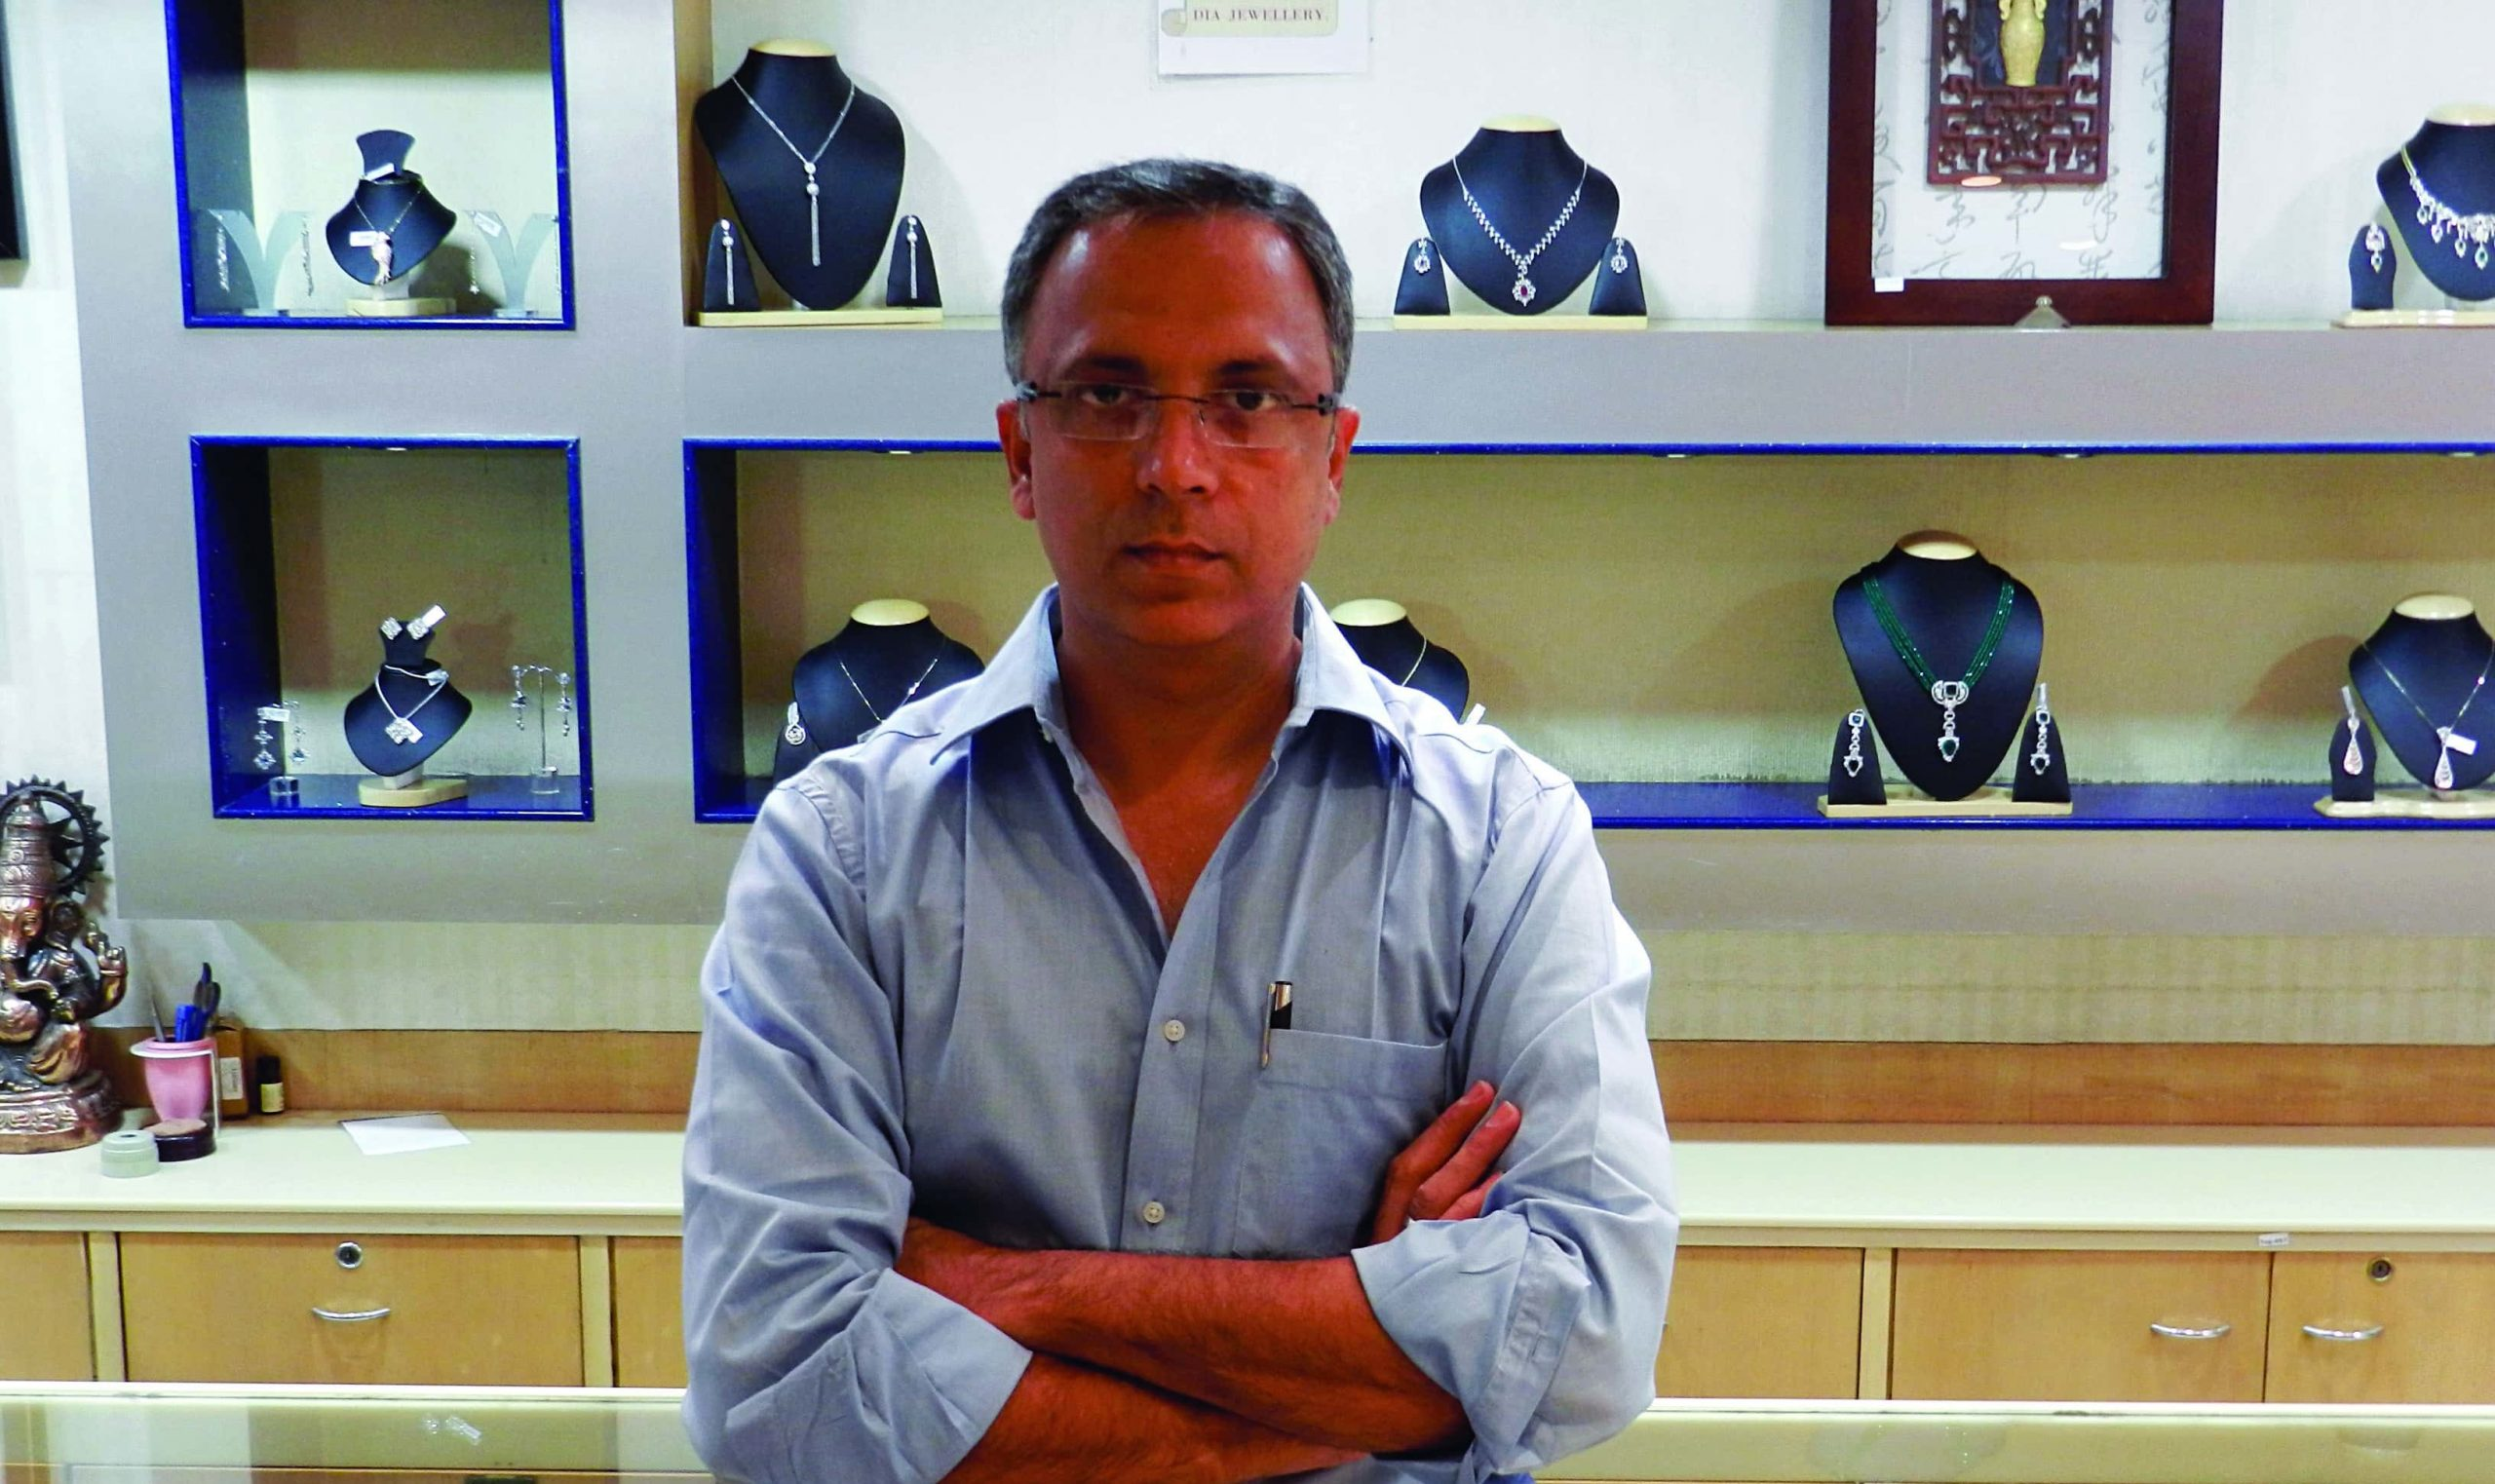 Hitesh Adesara, Director, Keshavji Chhaganlal Jewellers Pvt Ltd